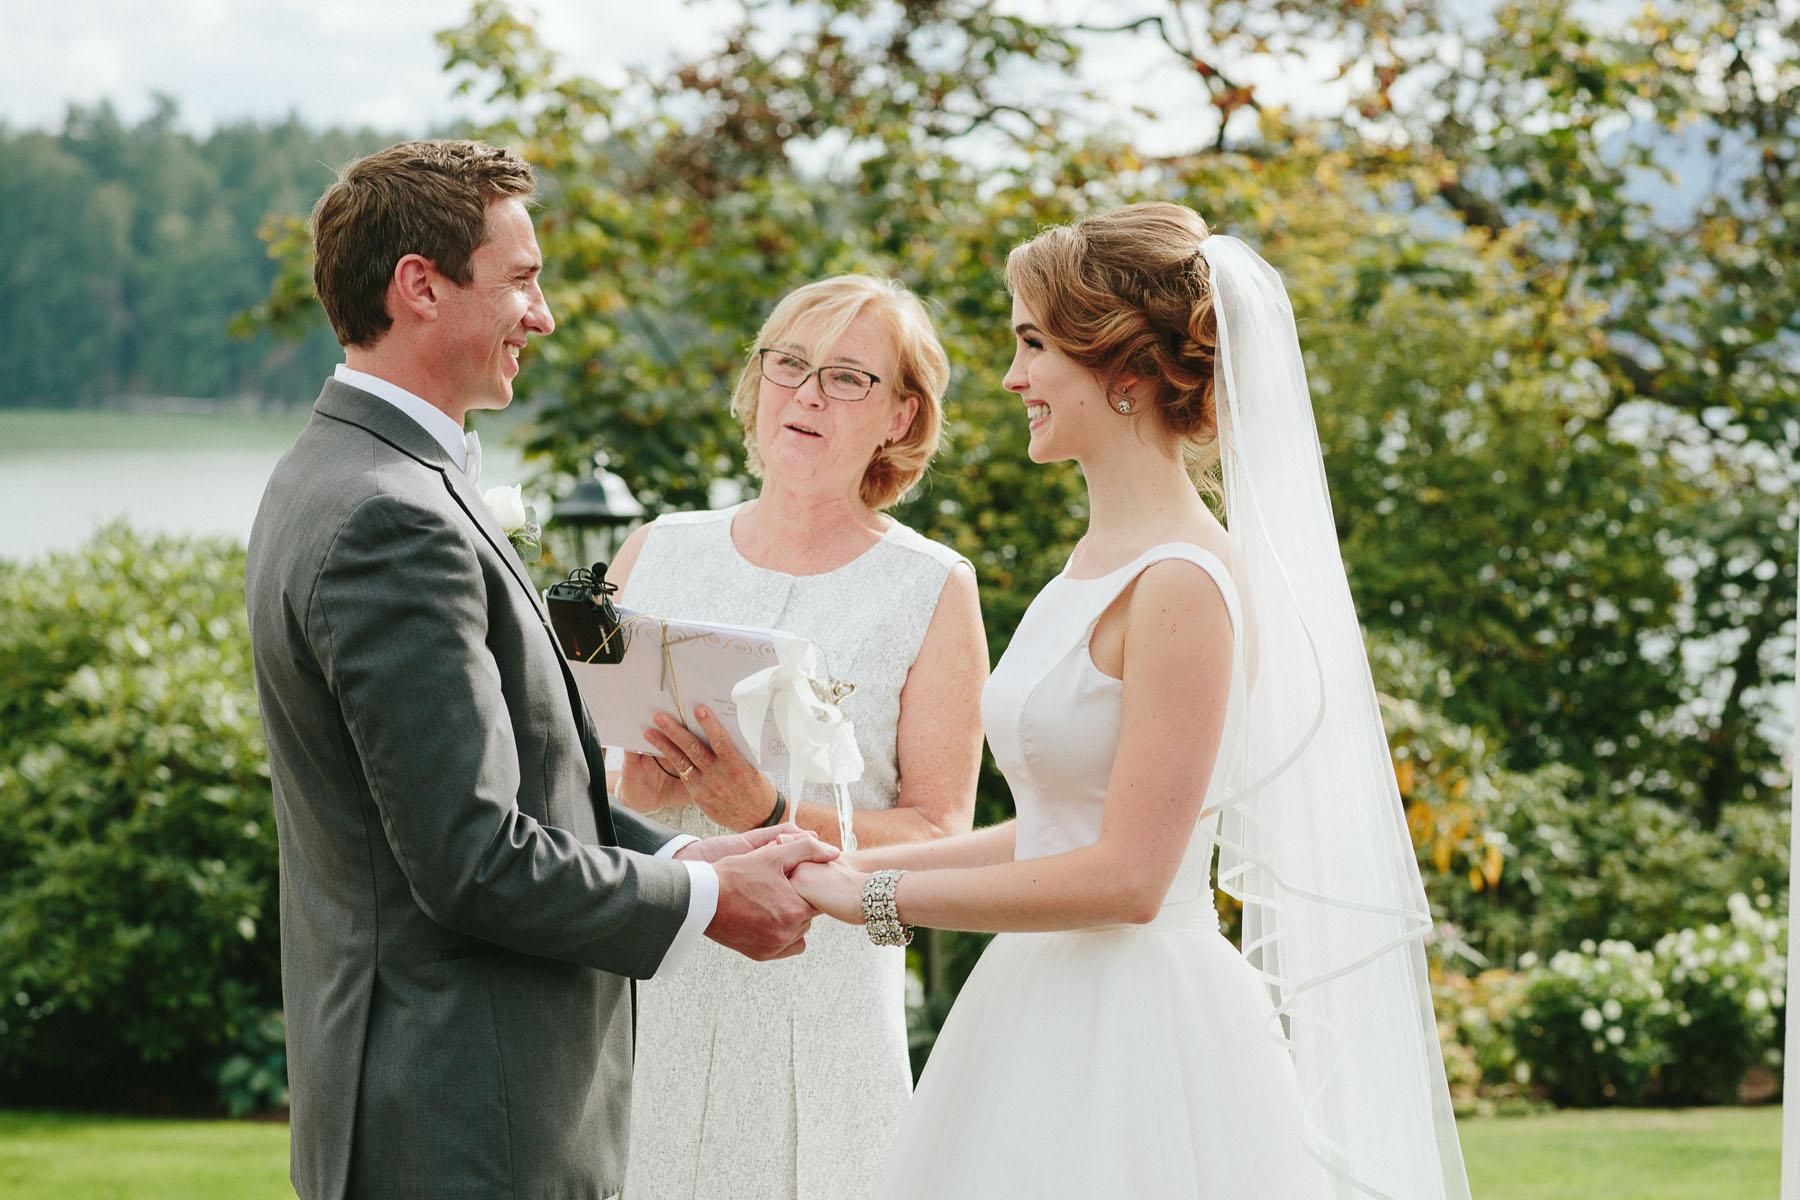 thetis-island-wedding-photographer-rp-rn-084.jpg